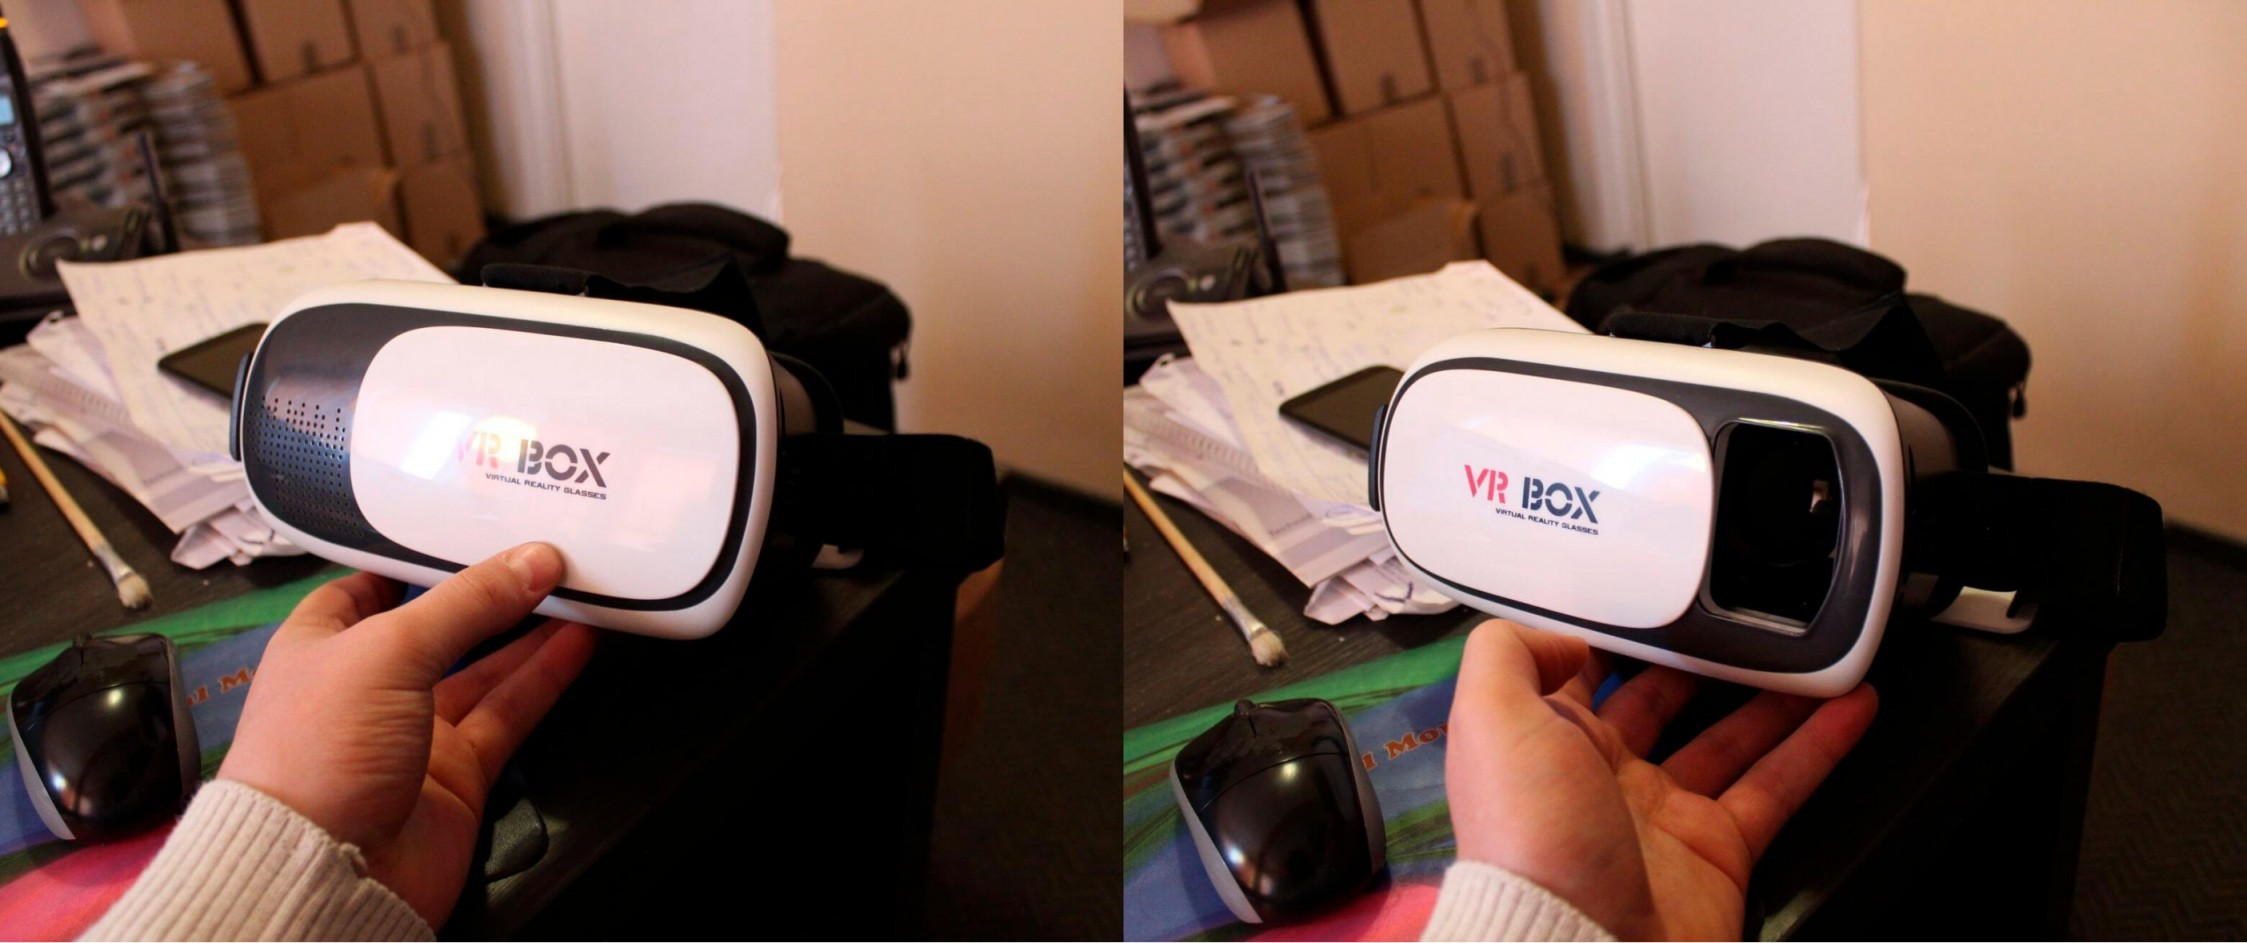 VR-BOX-klapka